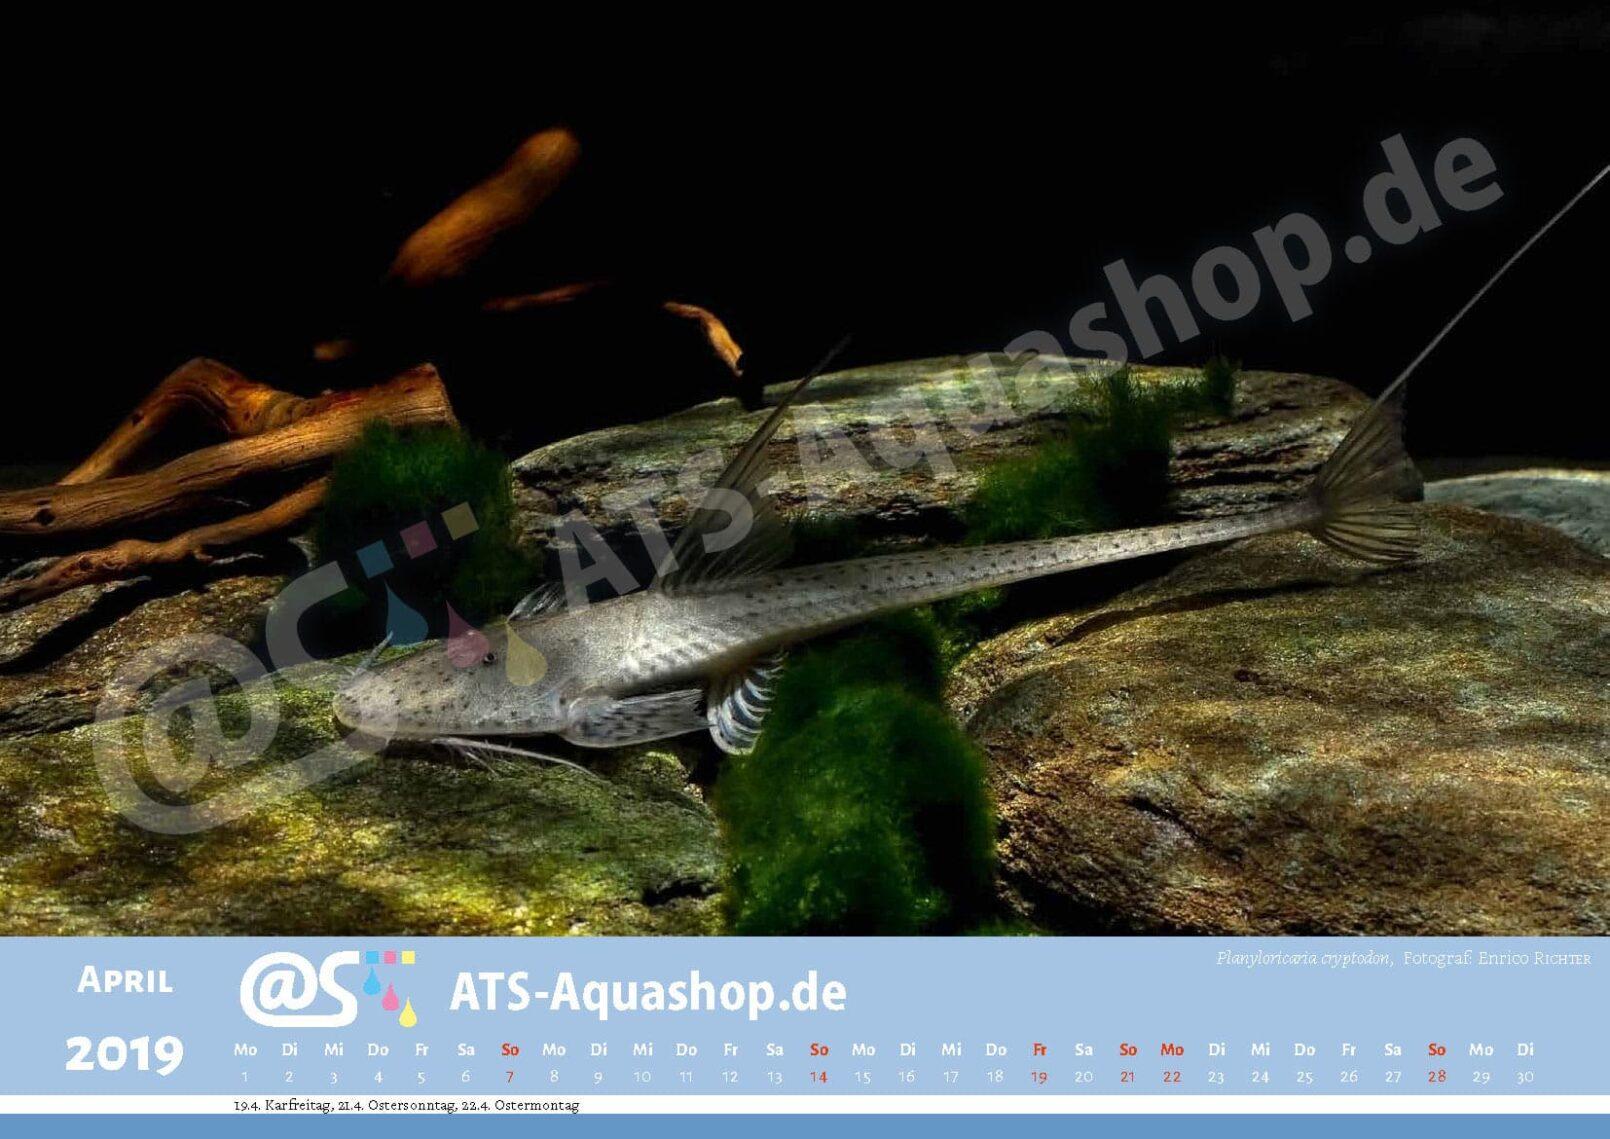 Foto Jahreskalender 2019 DIN A3: Planiloricaria cryptodon